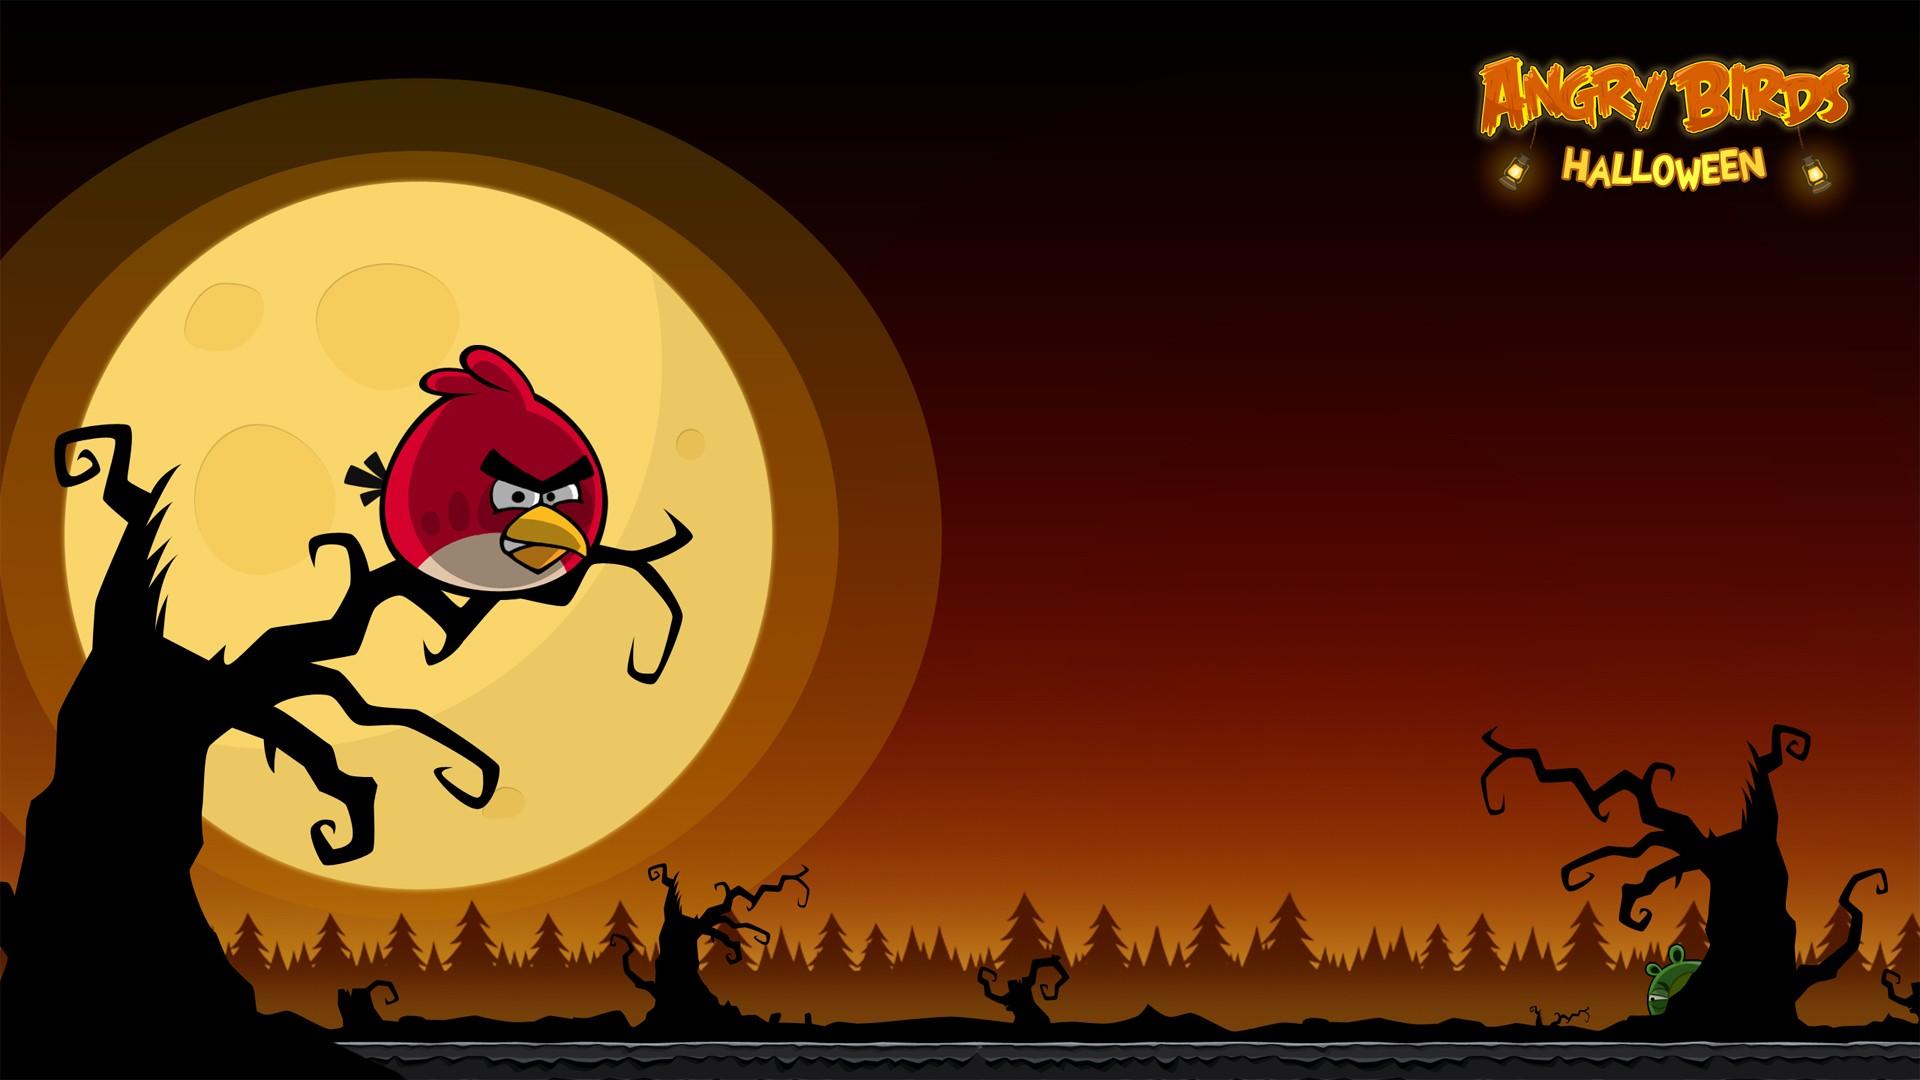 Angry Birds Halloween - 1920x1080